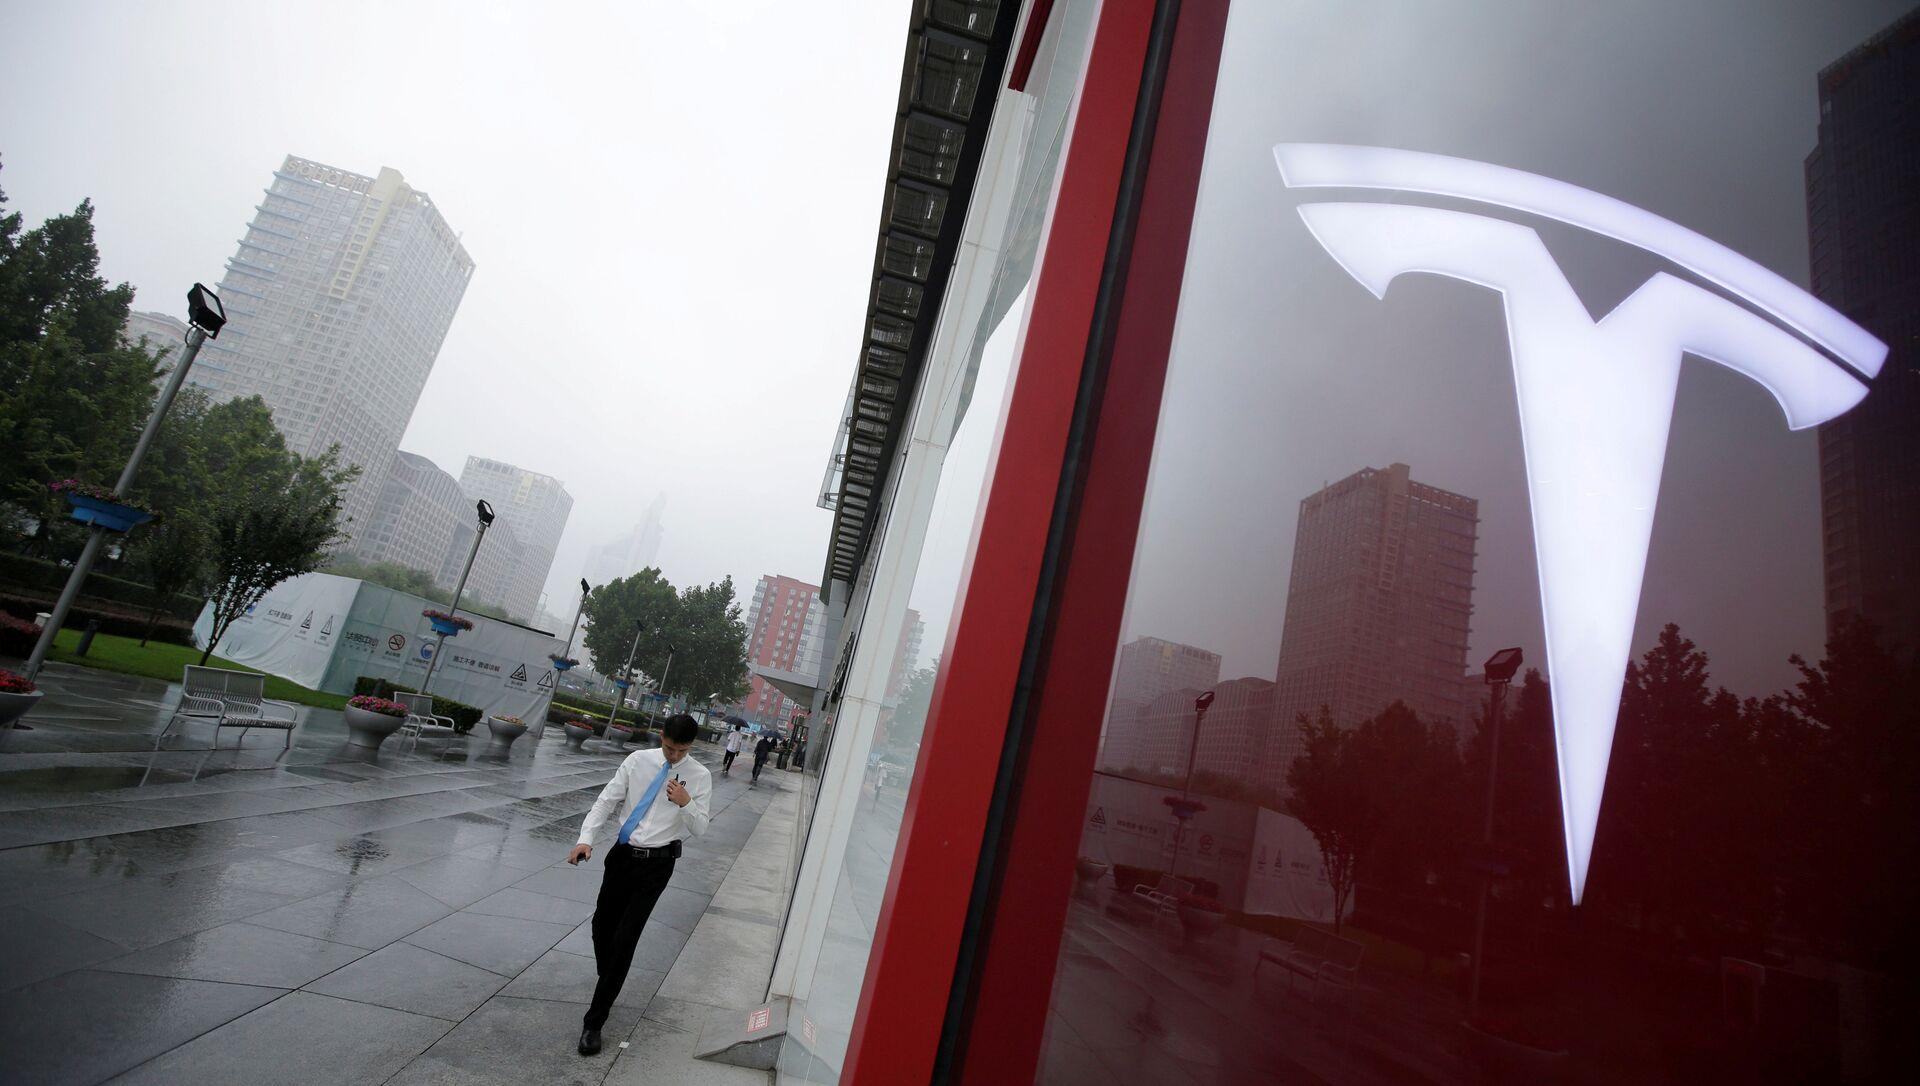 A man walks near a logo of Tesla outside its China headquarters at China Central Mall in Beijing, China July 11, 2018 - Sputnik Türkiye, 1920, 27.04.2021